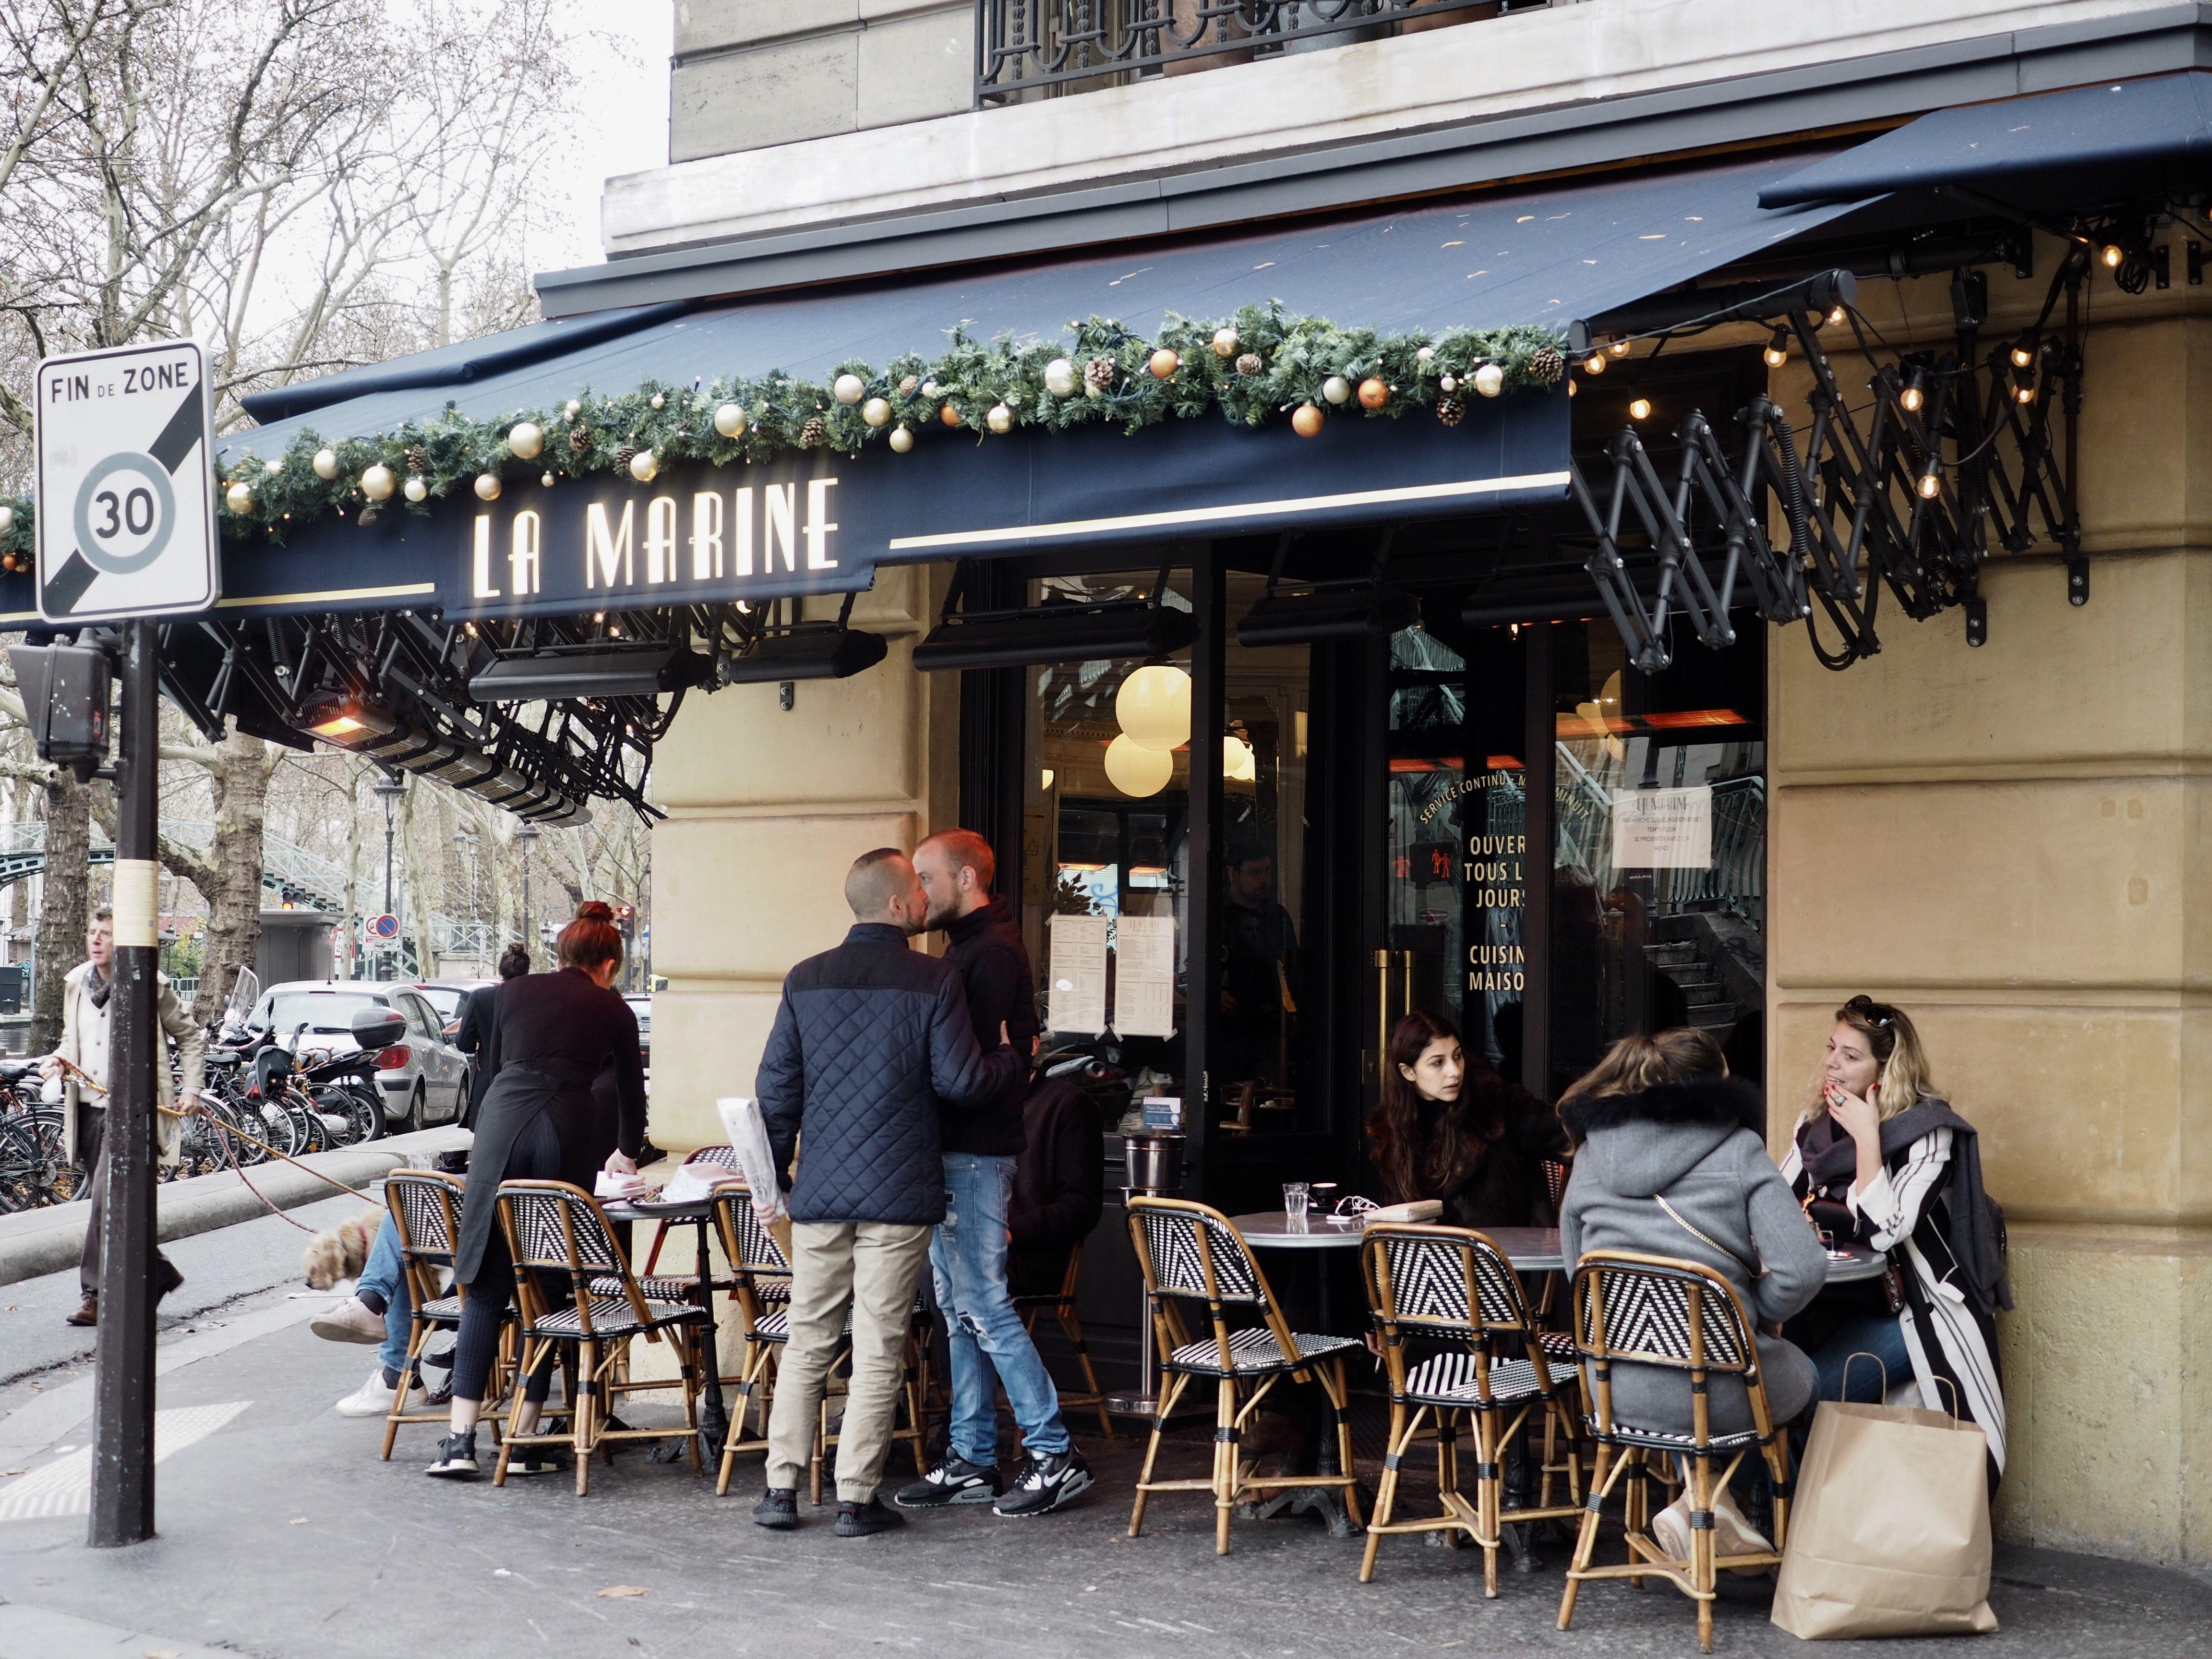 La marine artisan restaurant french food